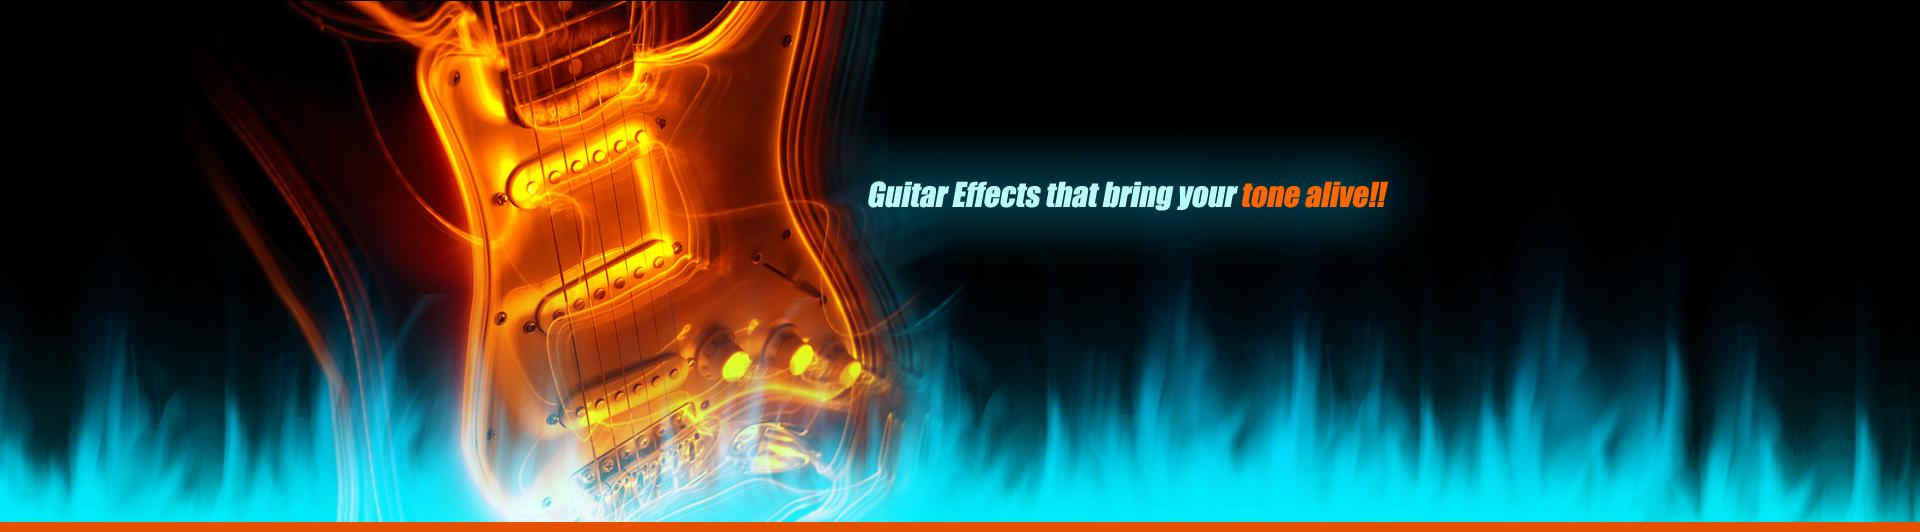 DLS_Effects2